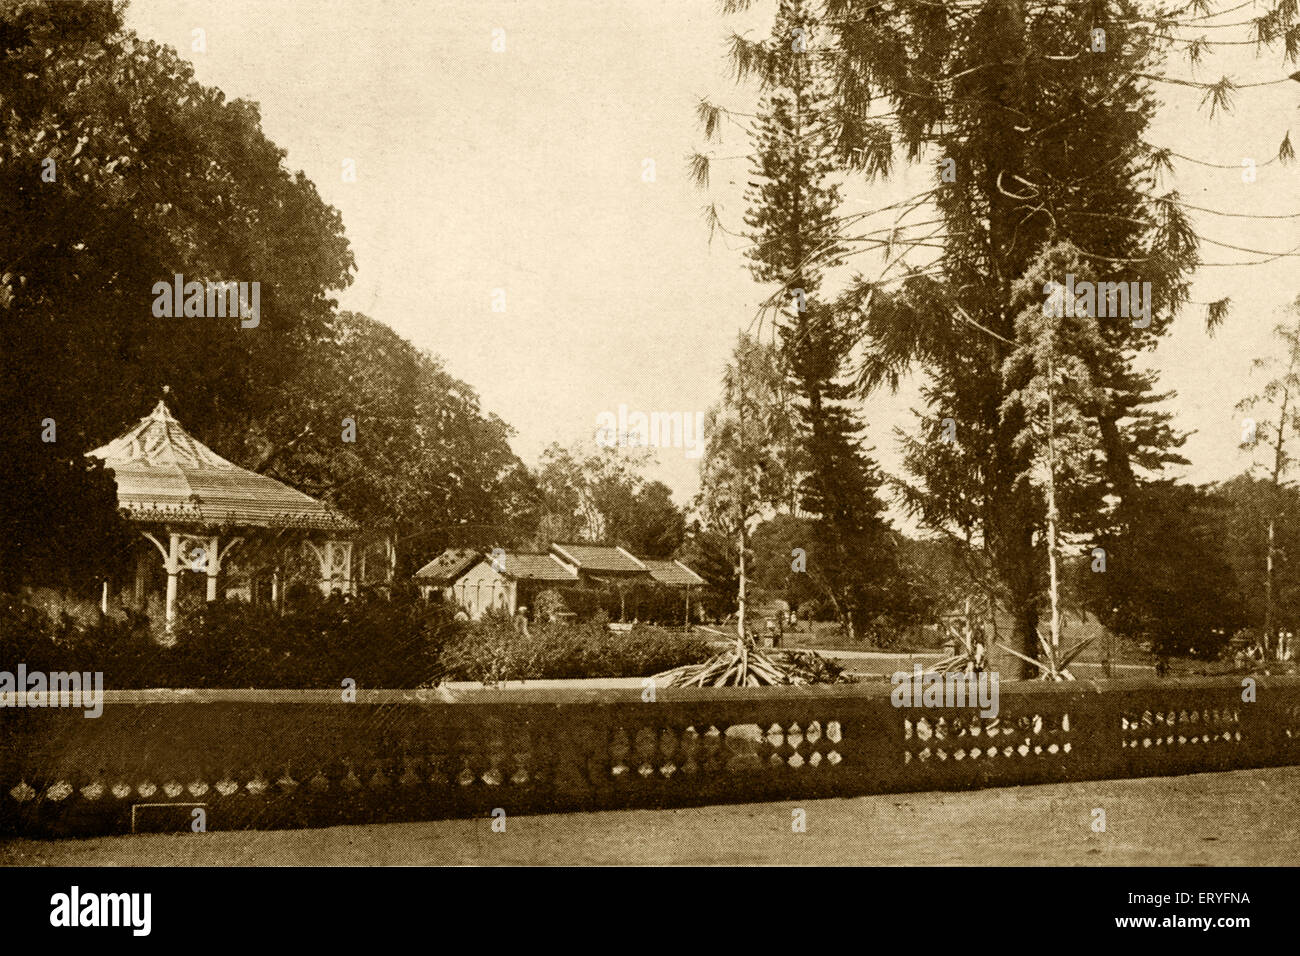 Old bandstand in lalbagh botanical gardens ; Bangalore ; Karnataka ; India - Stock Image